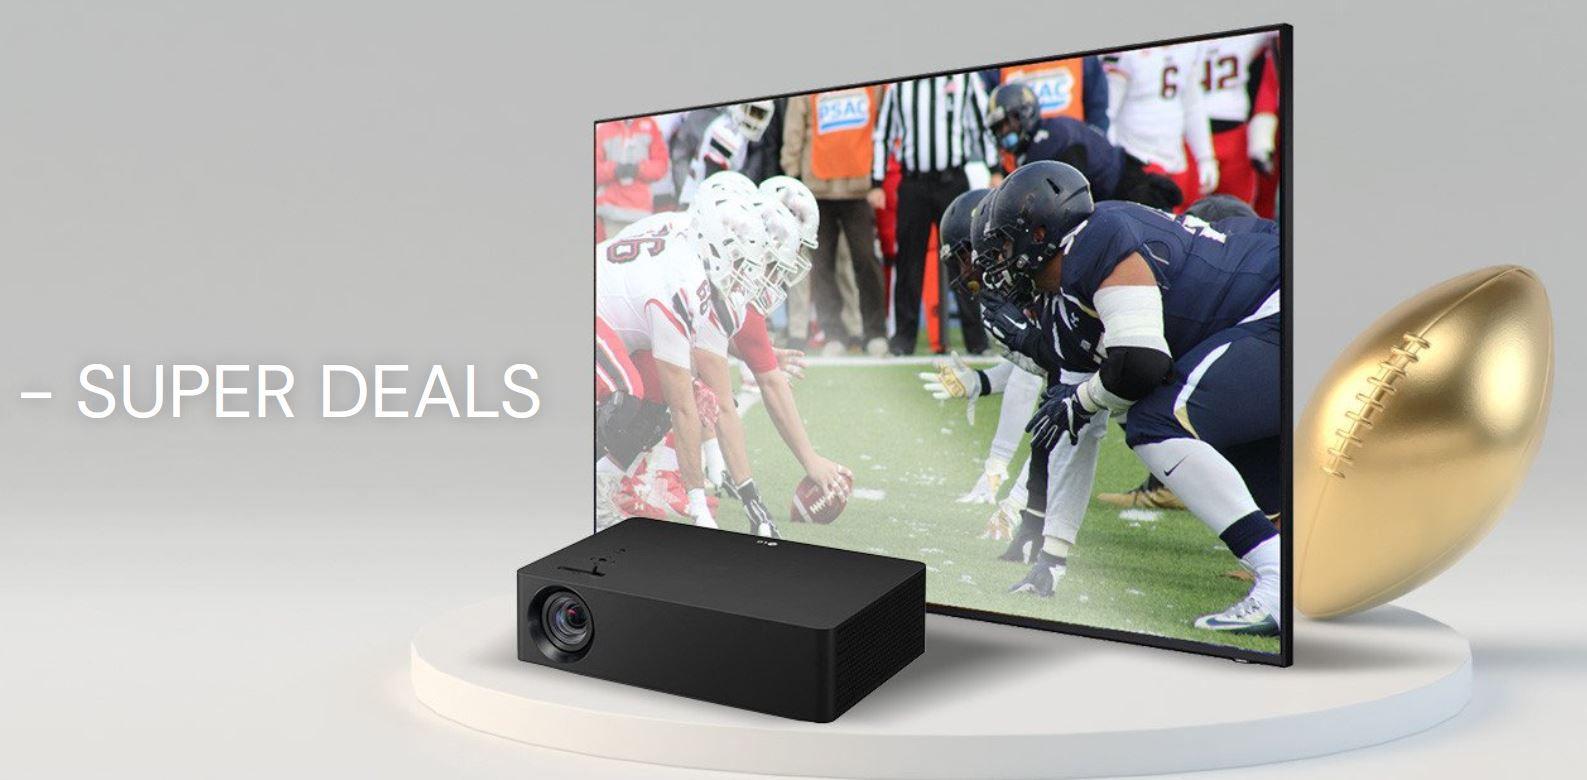 Office Partner Super Bowl Angebote: extra Rabatt auf Beamer, Leinwände, Displays & Co